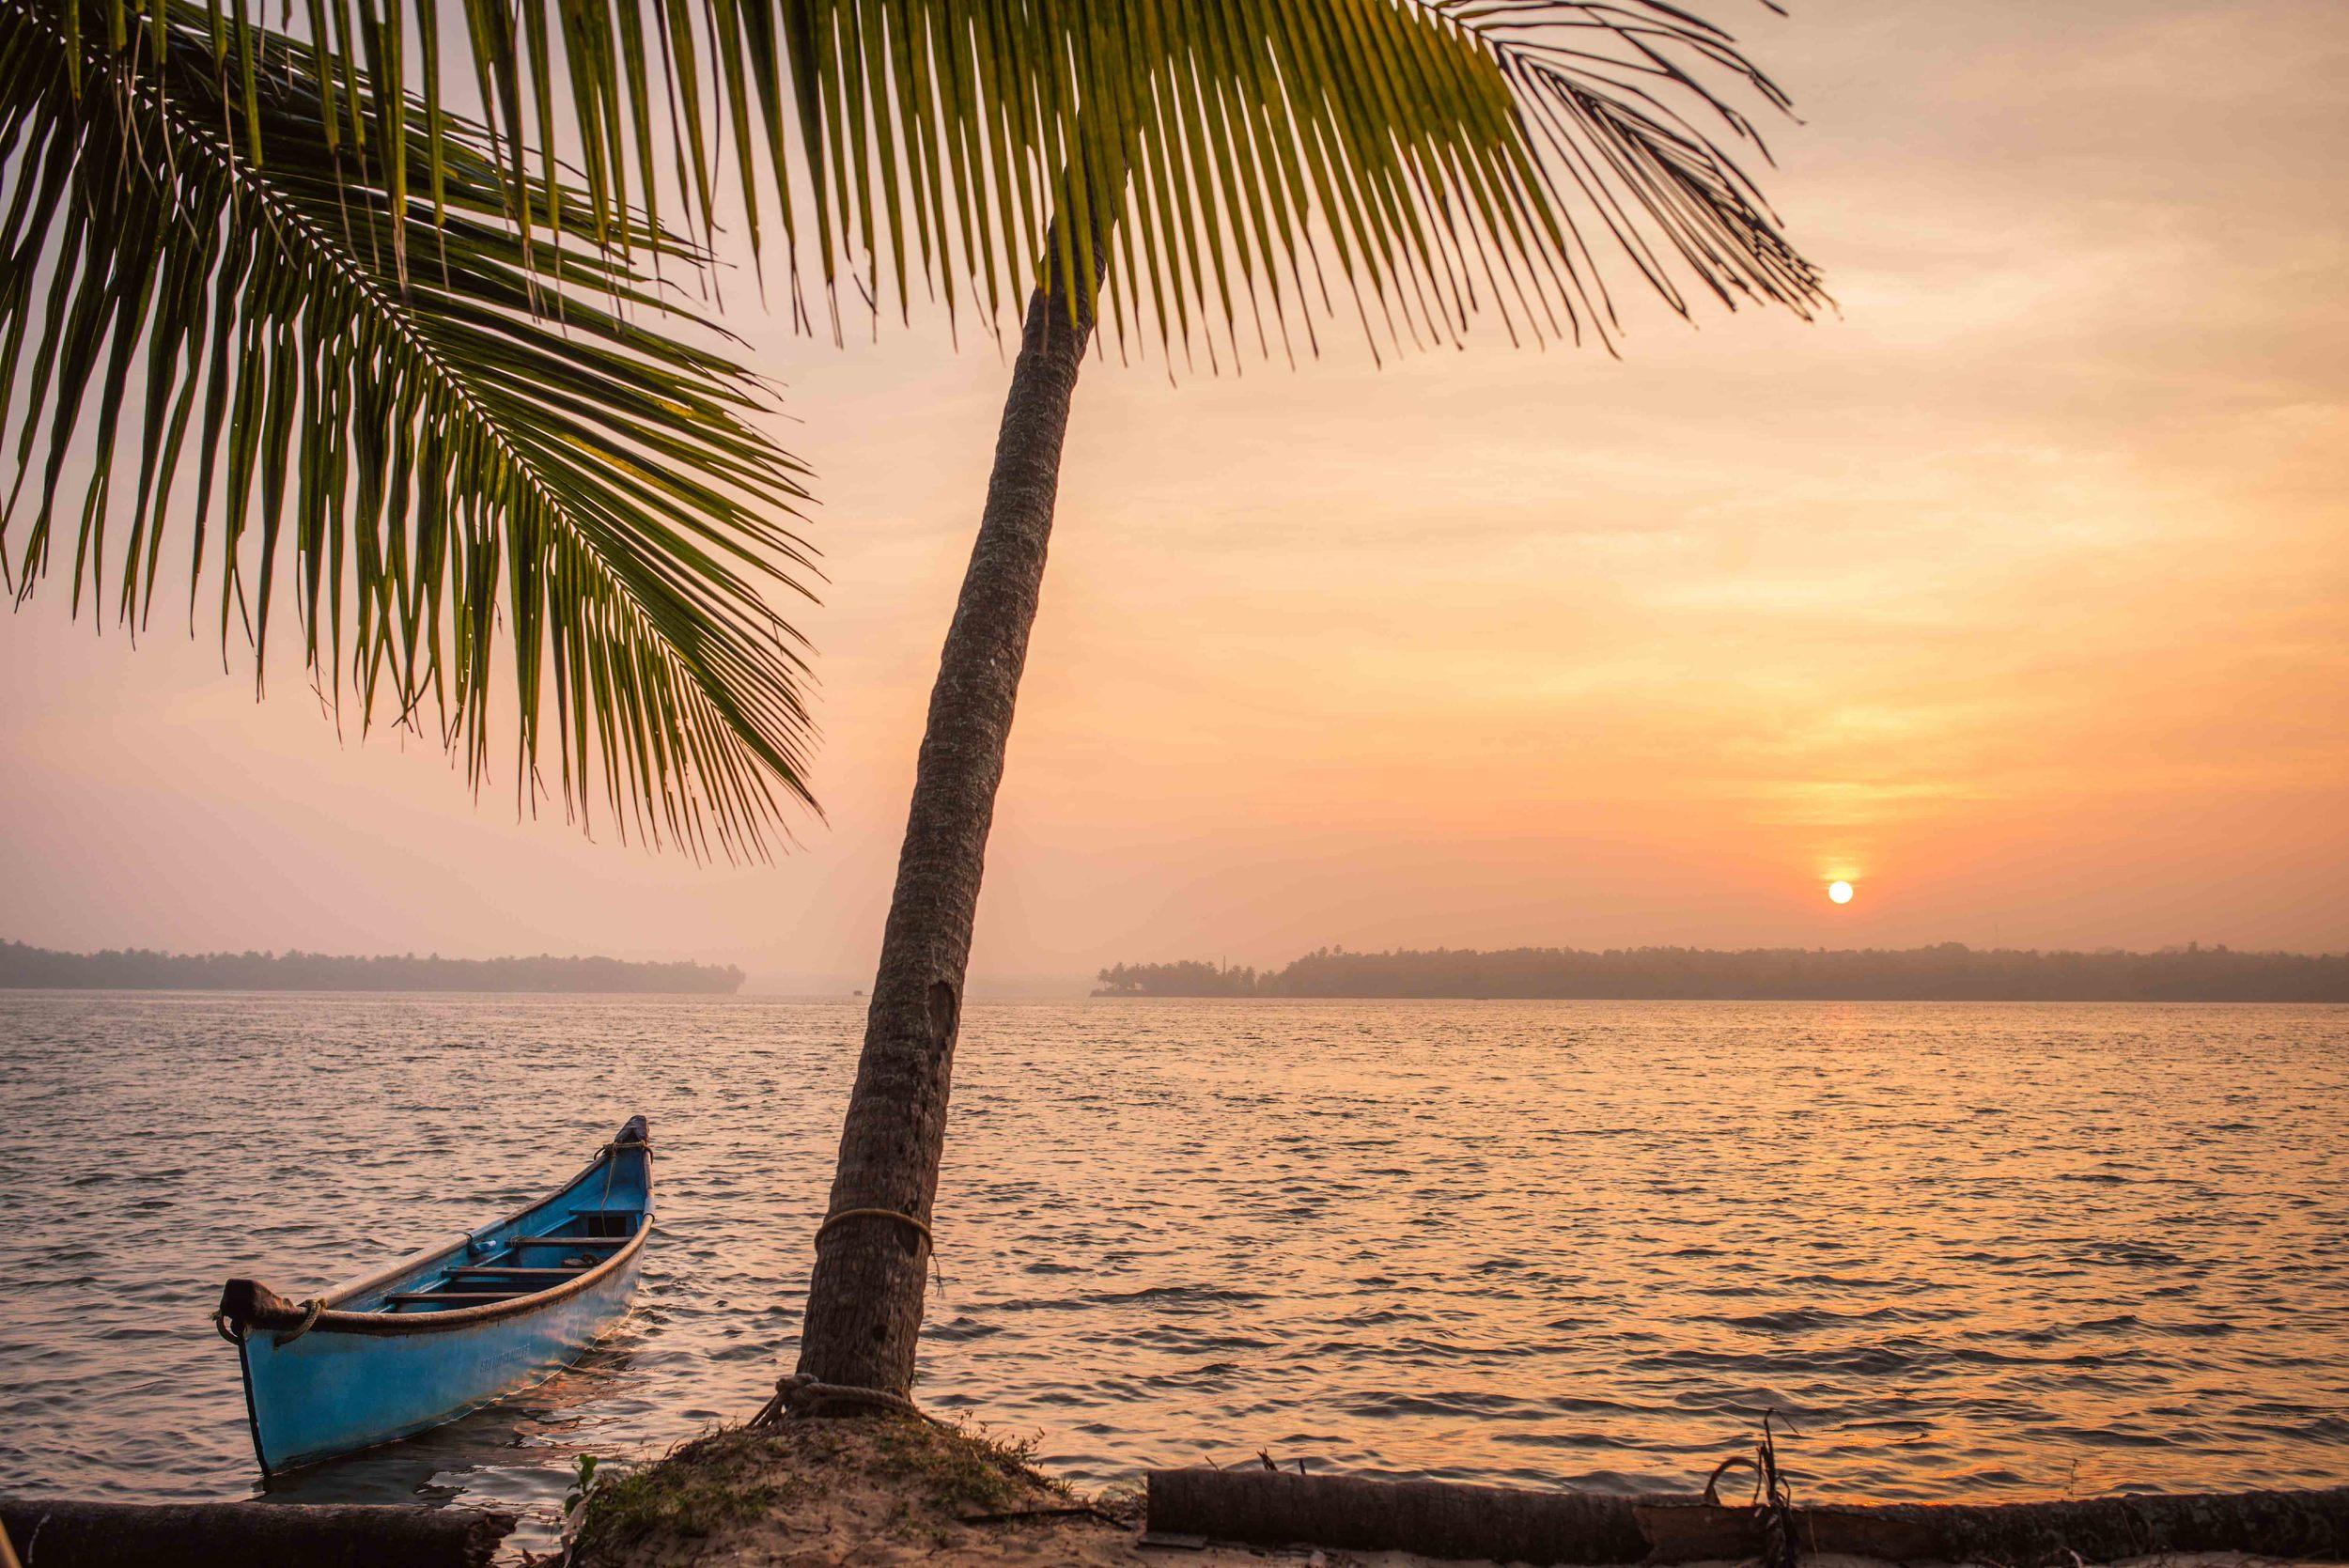 JJfoto-india-canoe.jpg